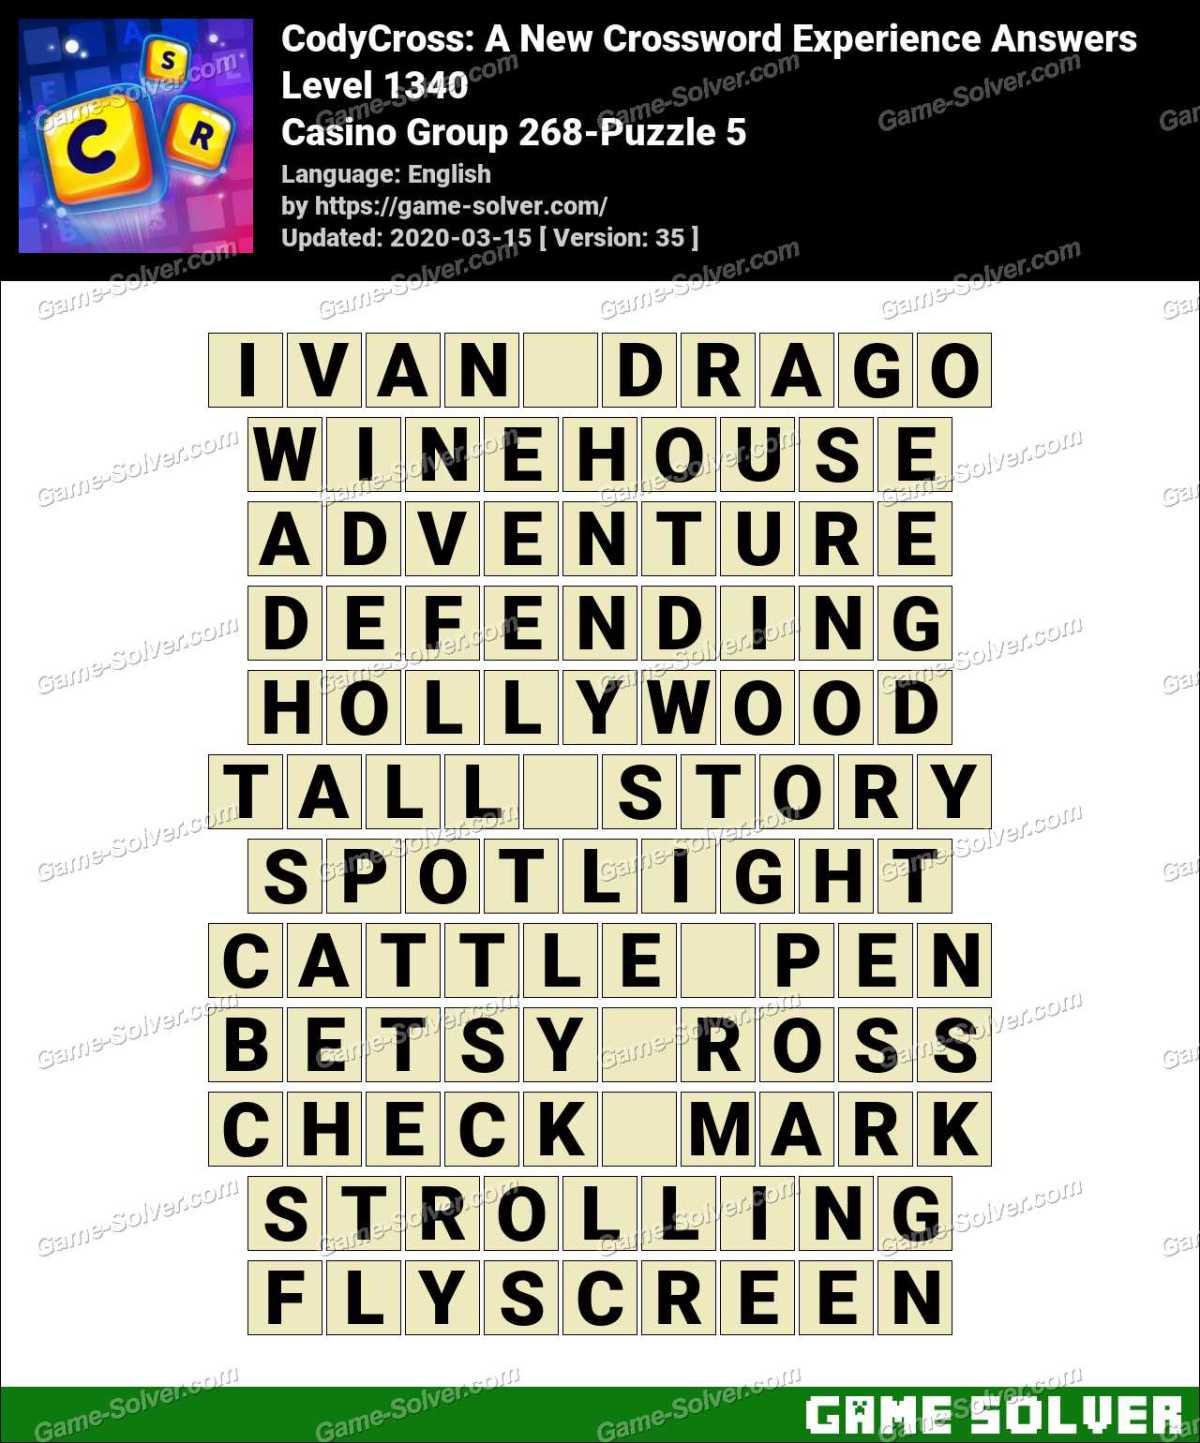 CodyCross Casino Group 268-Puzzle 5 Answers